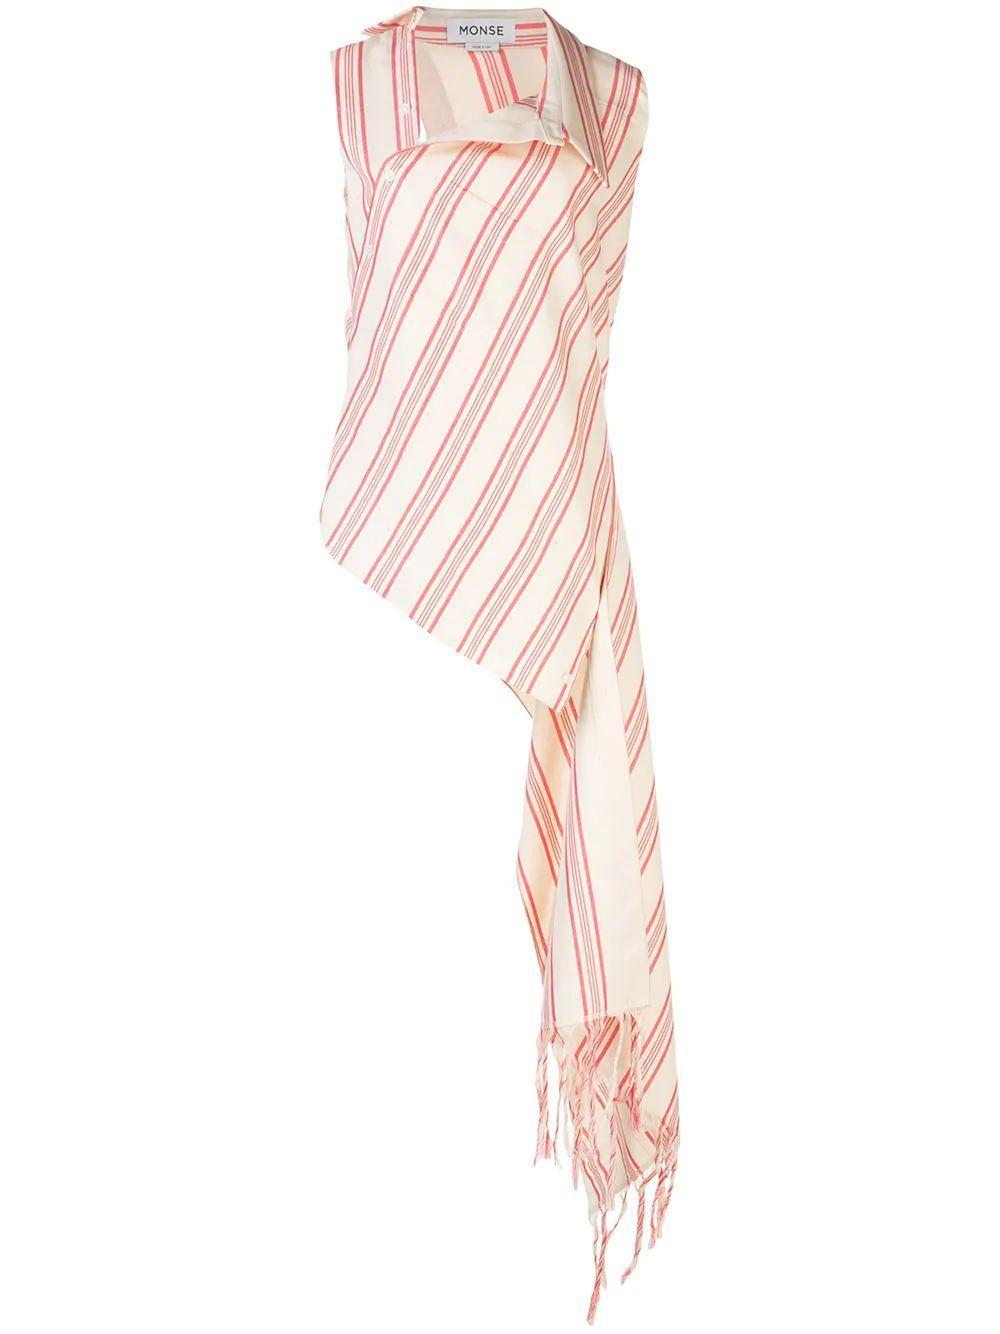 Fringe Stripe Open Back Cascade Top Item # MS200527FHS